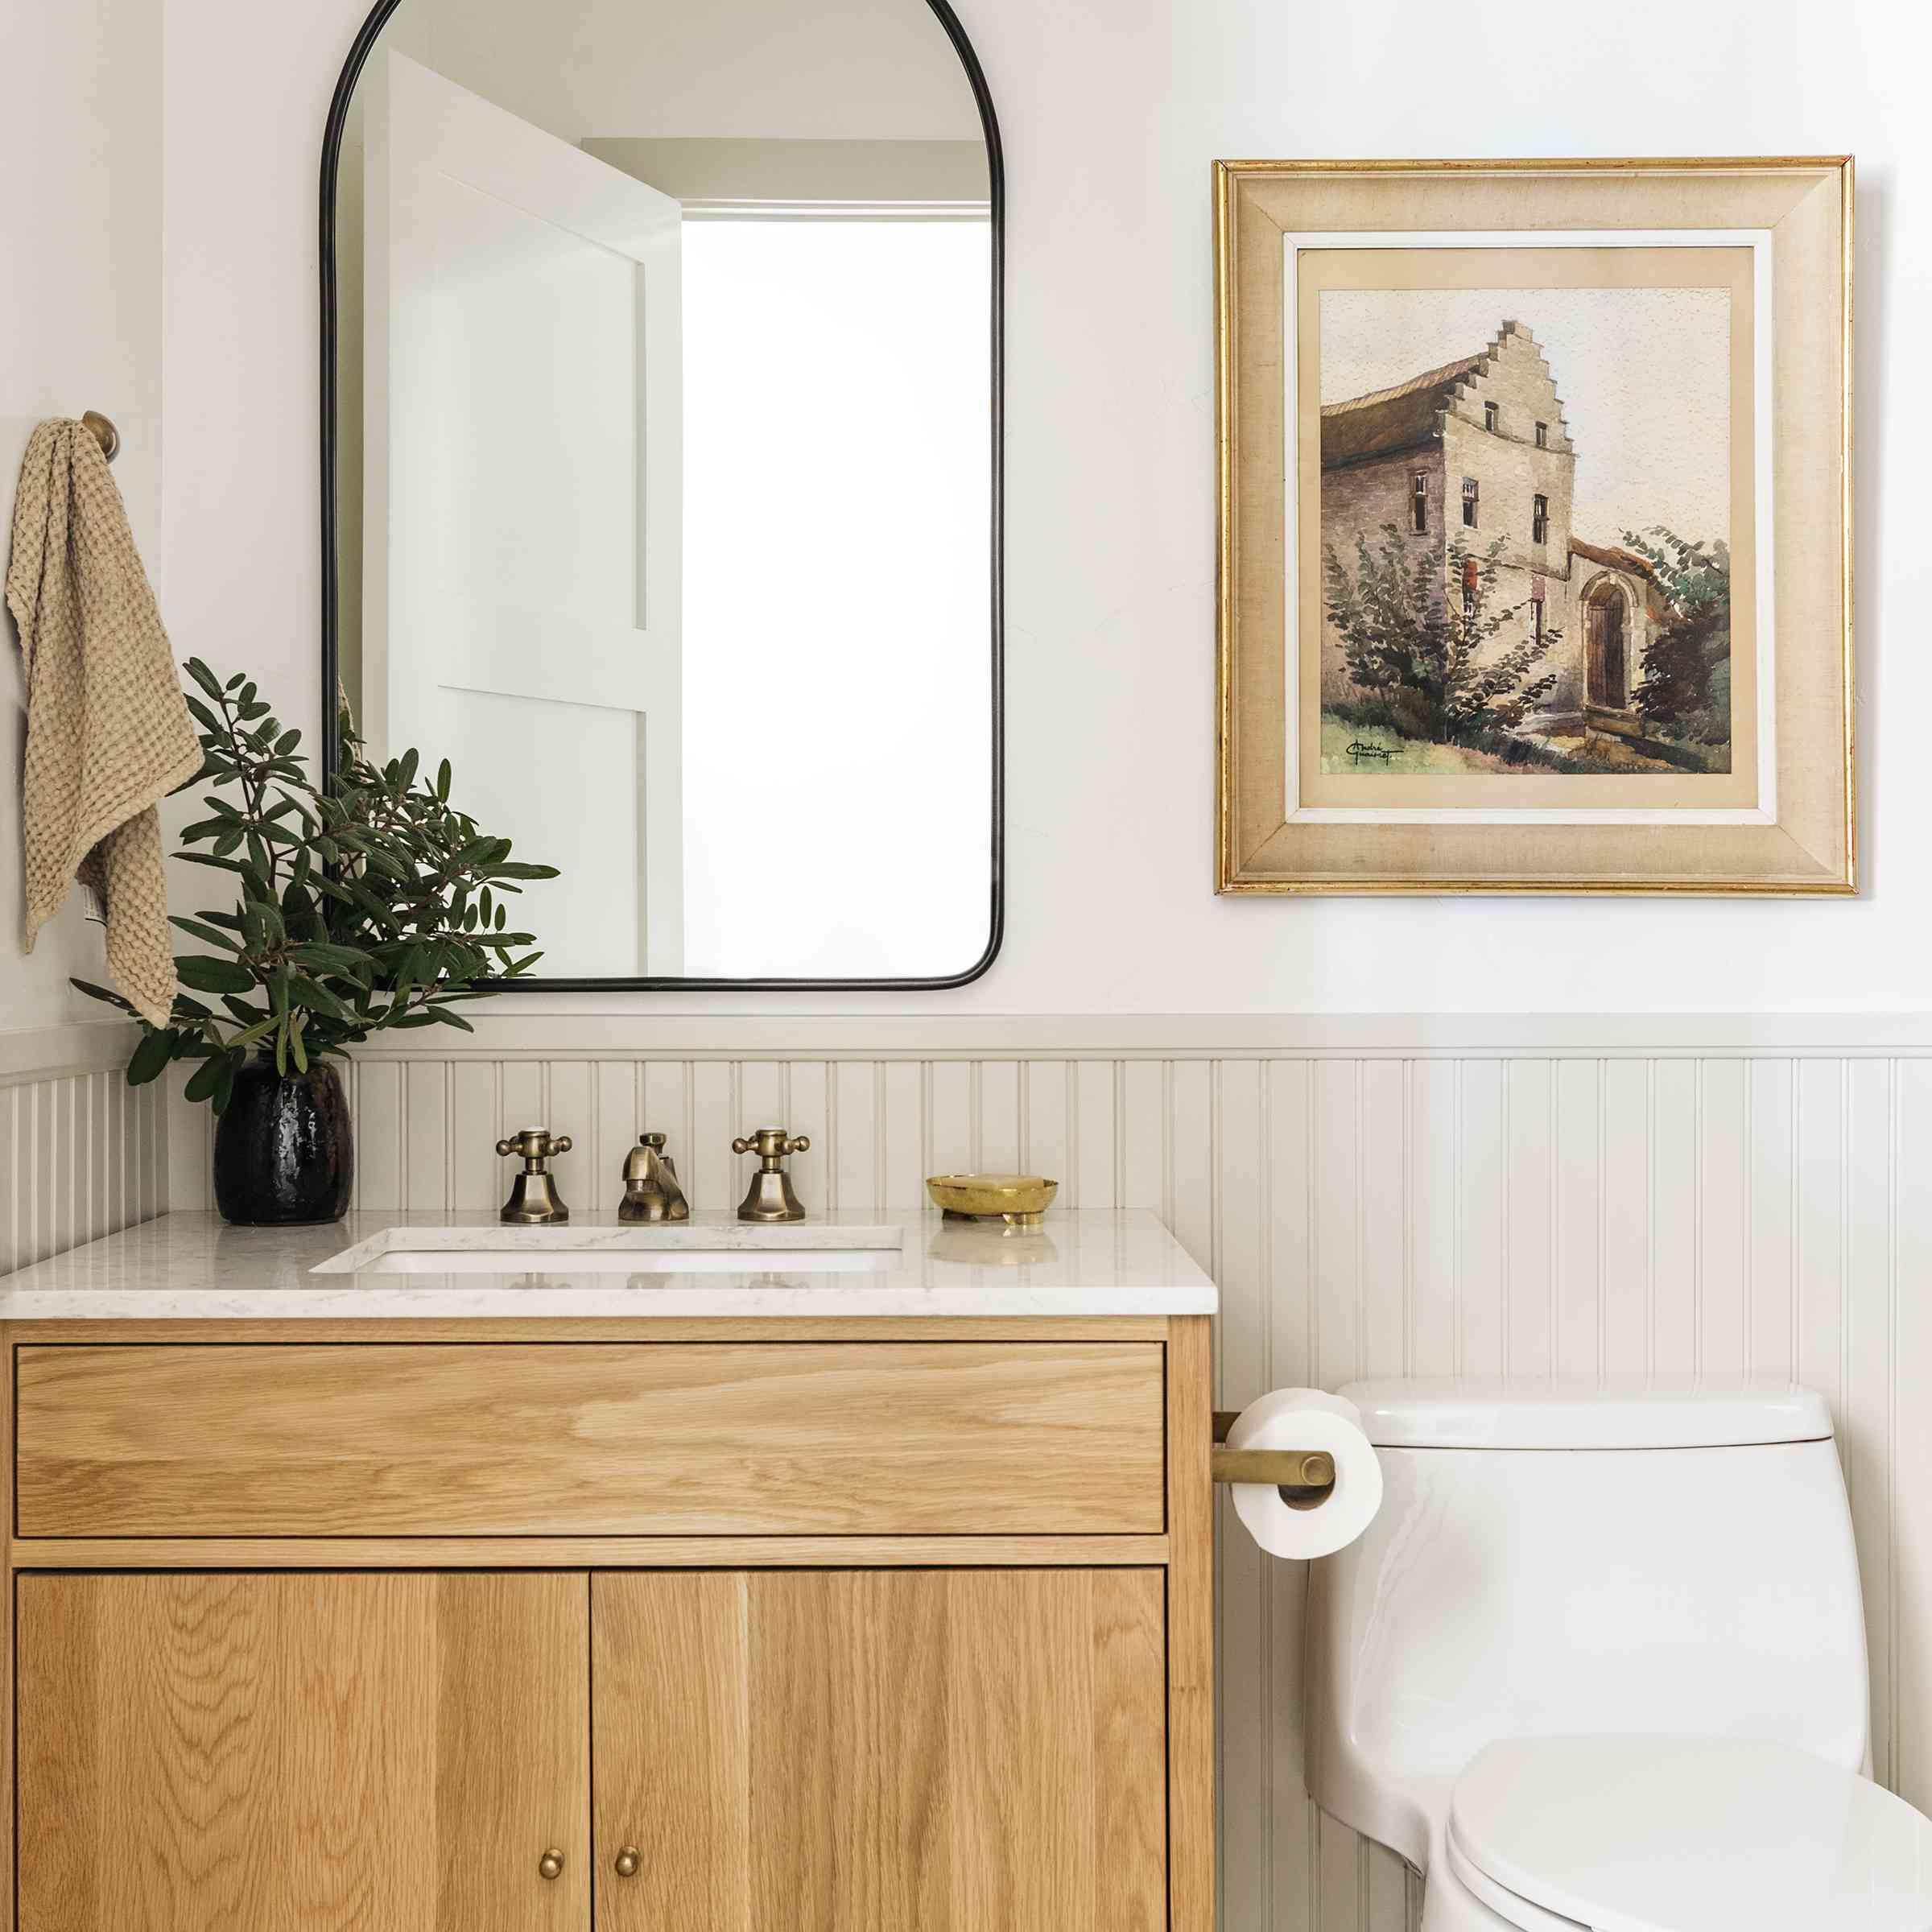 Brett Foken home tour - bathroom with beadboard art and wooden vanity